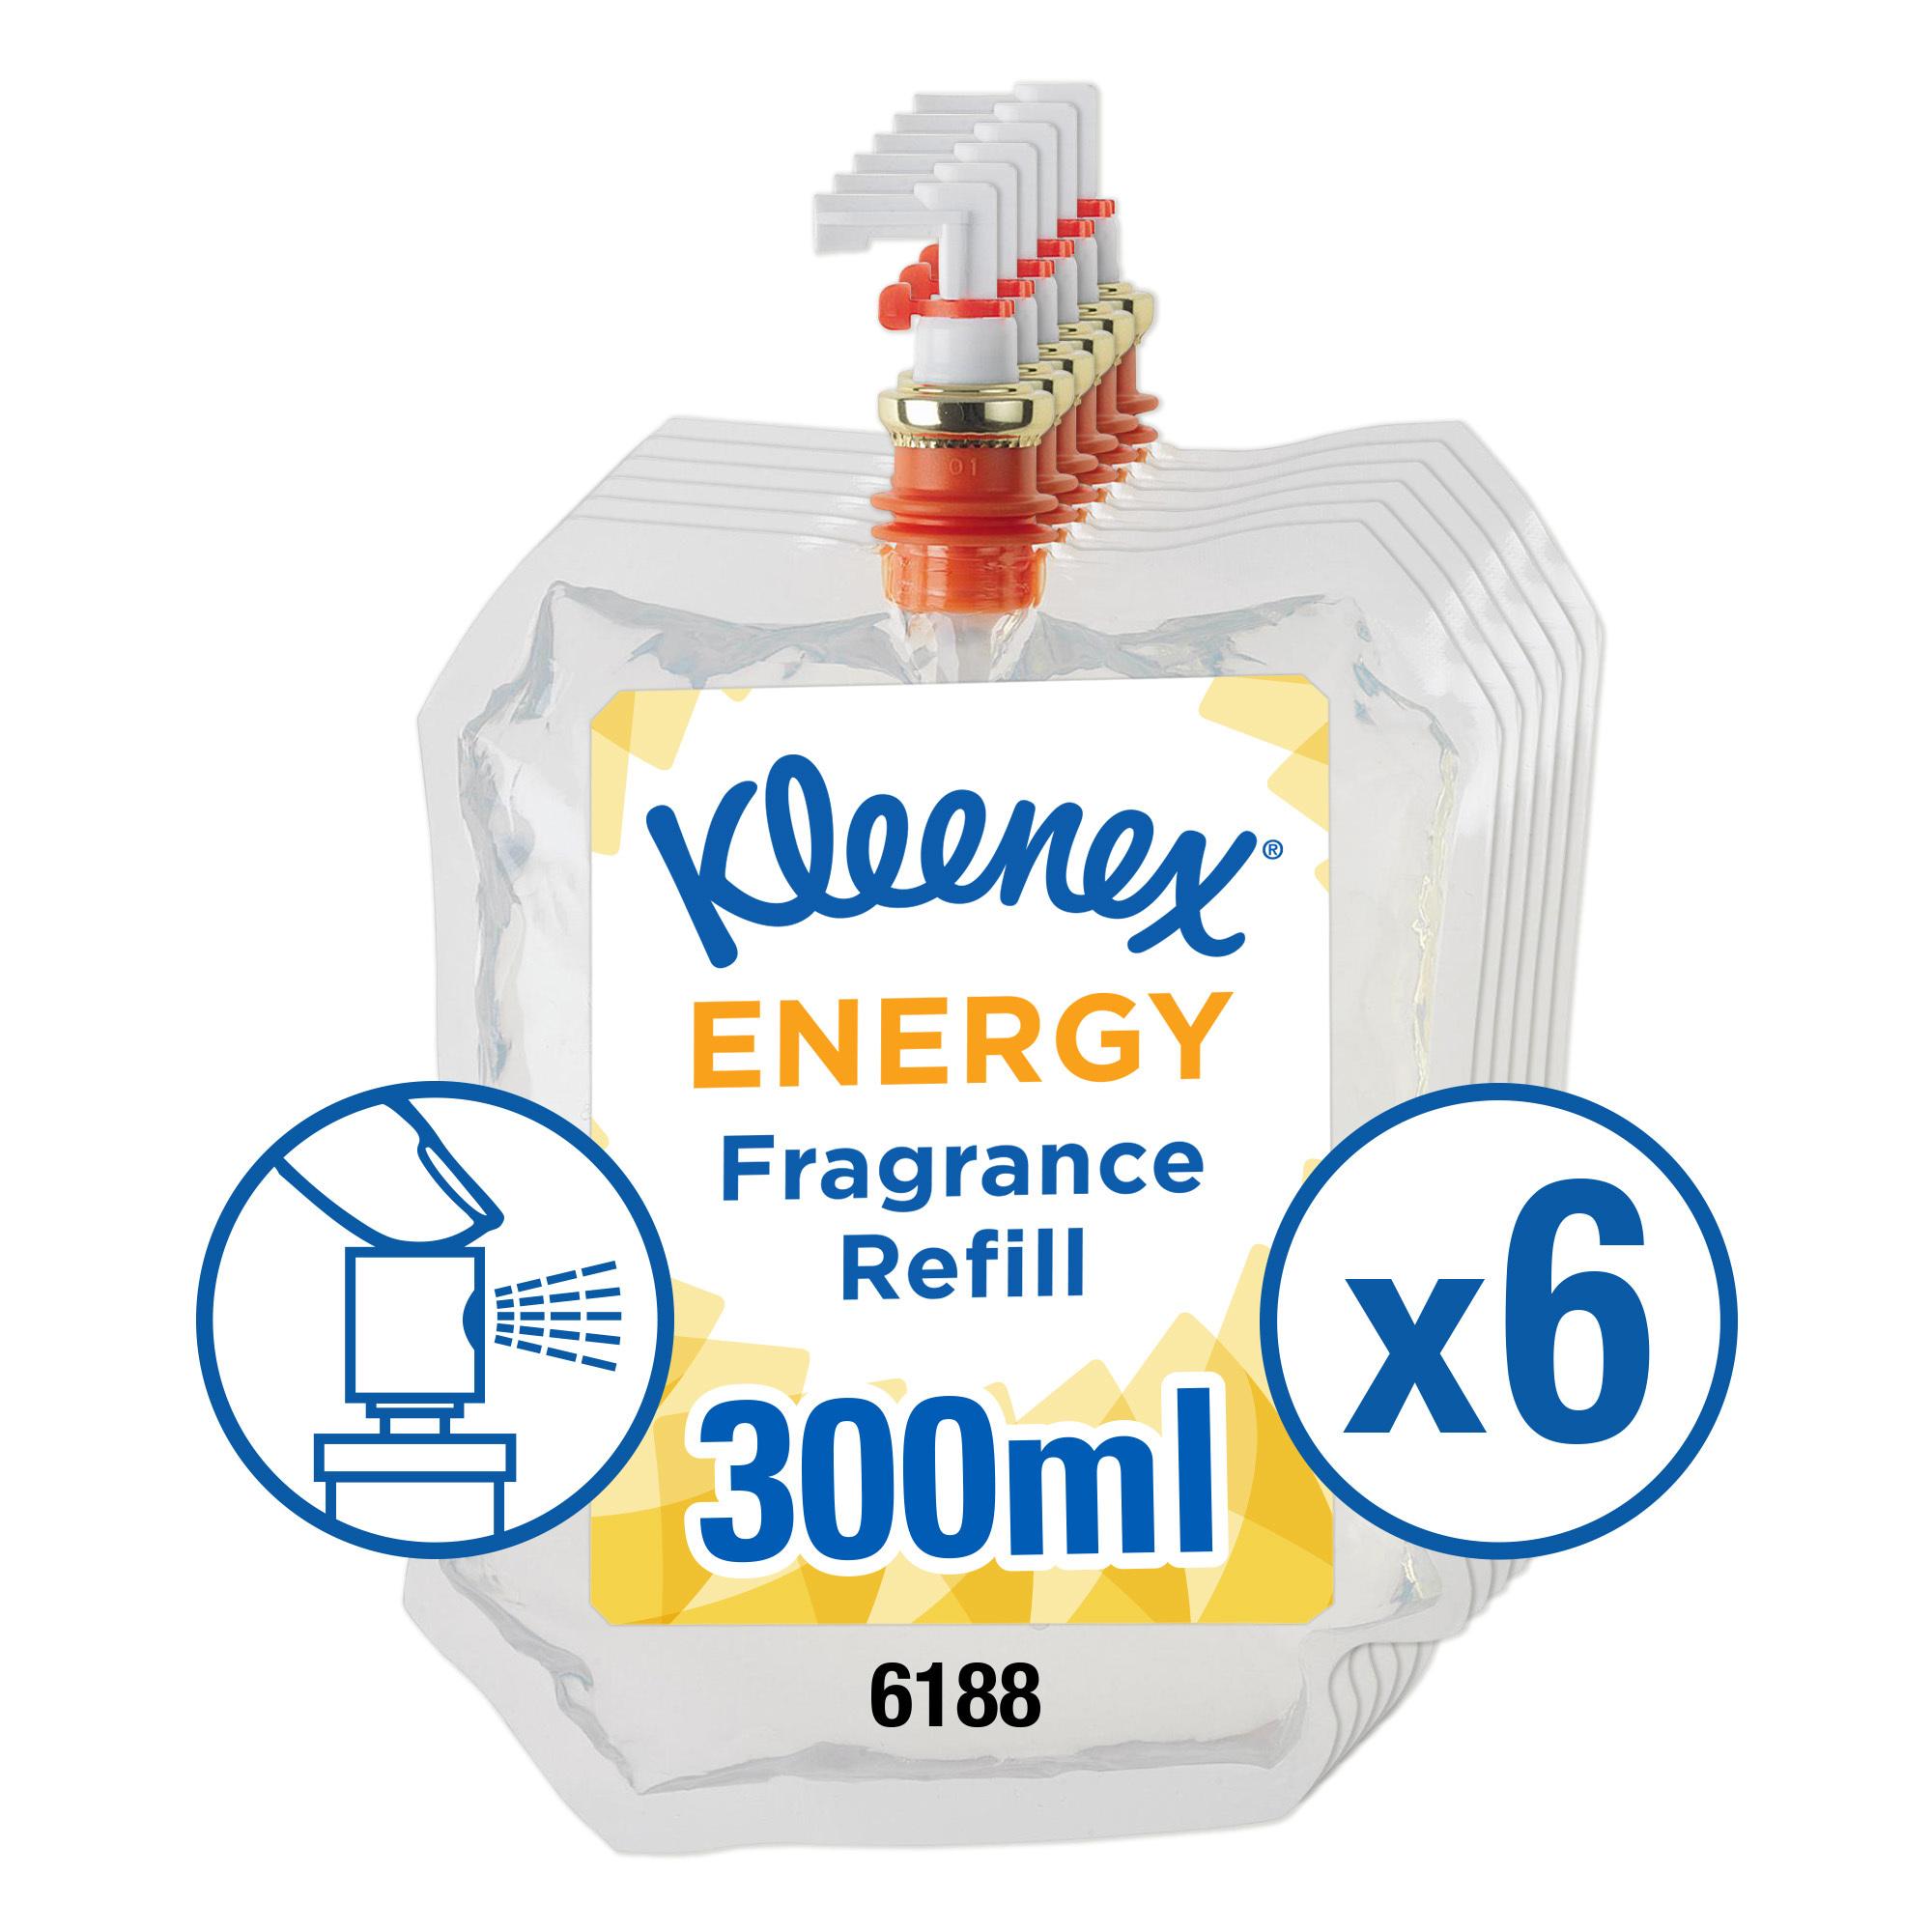 Air freshener Kleenex Botanics Botanics Aircare Energy Refill 300ml Ref 6188 Pack 6